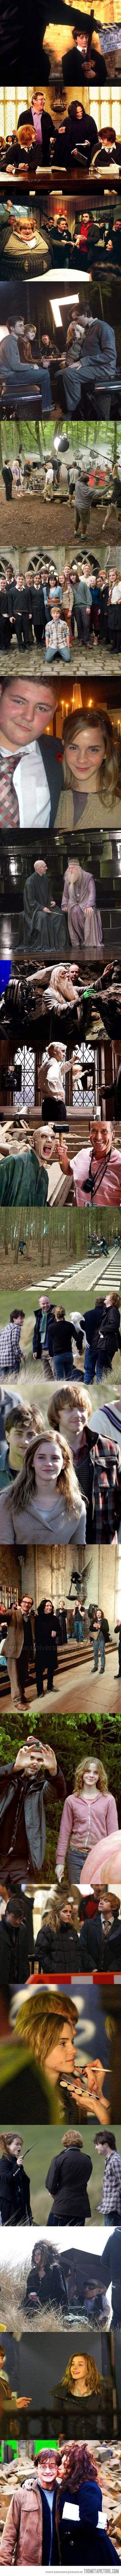 Harry Potter behind the scenes <3: